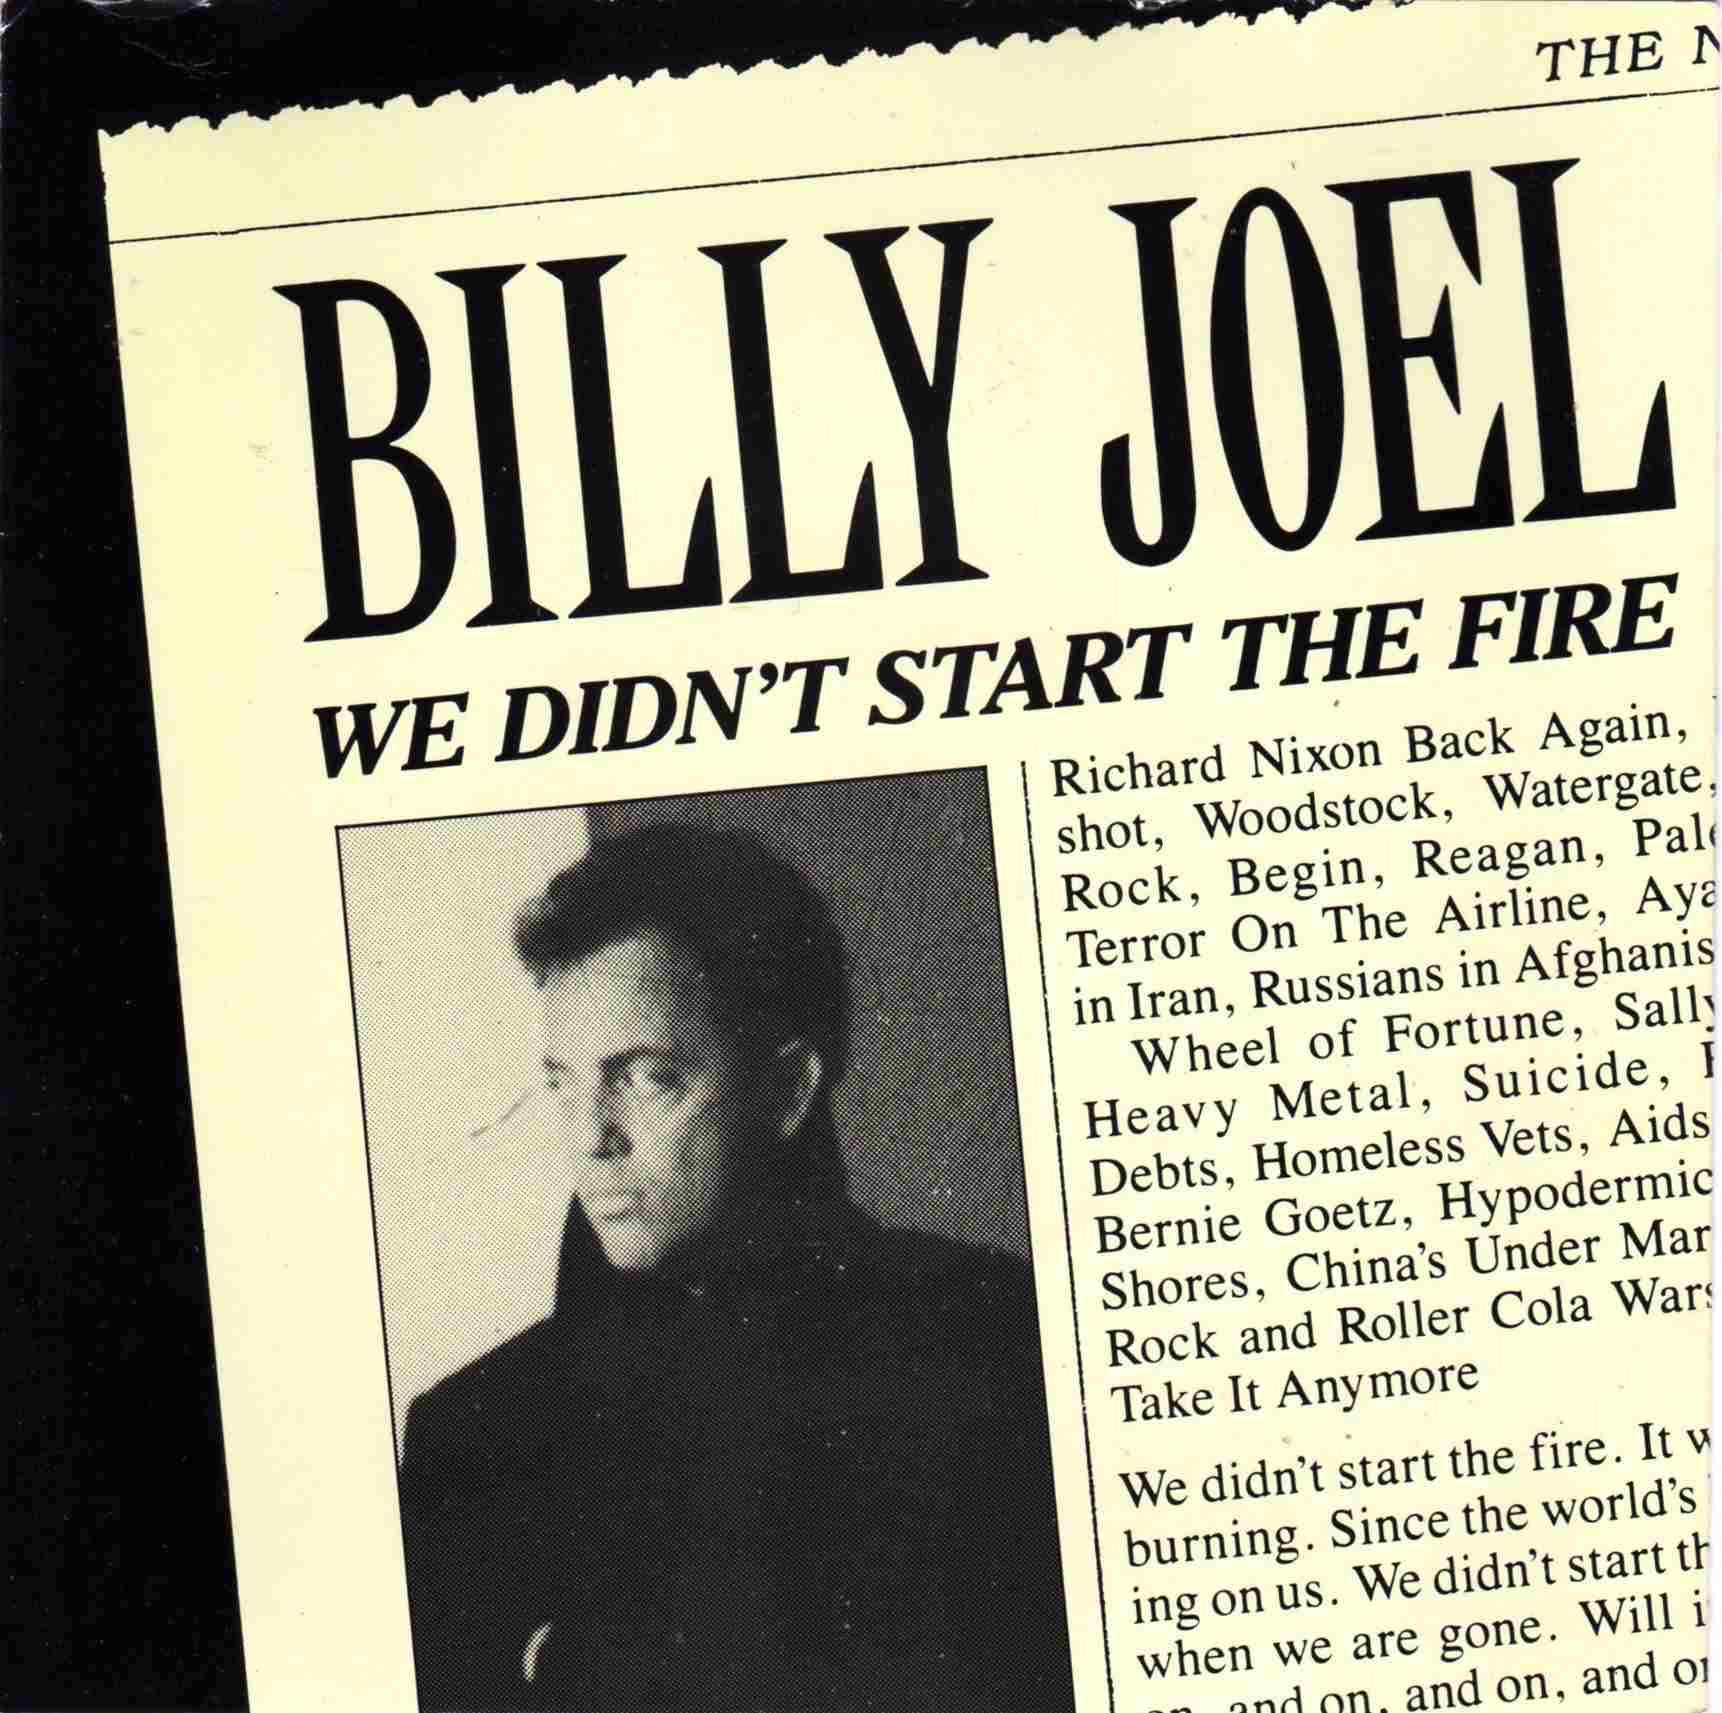 Billy Joel We Didn't Start the Fire